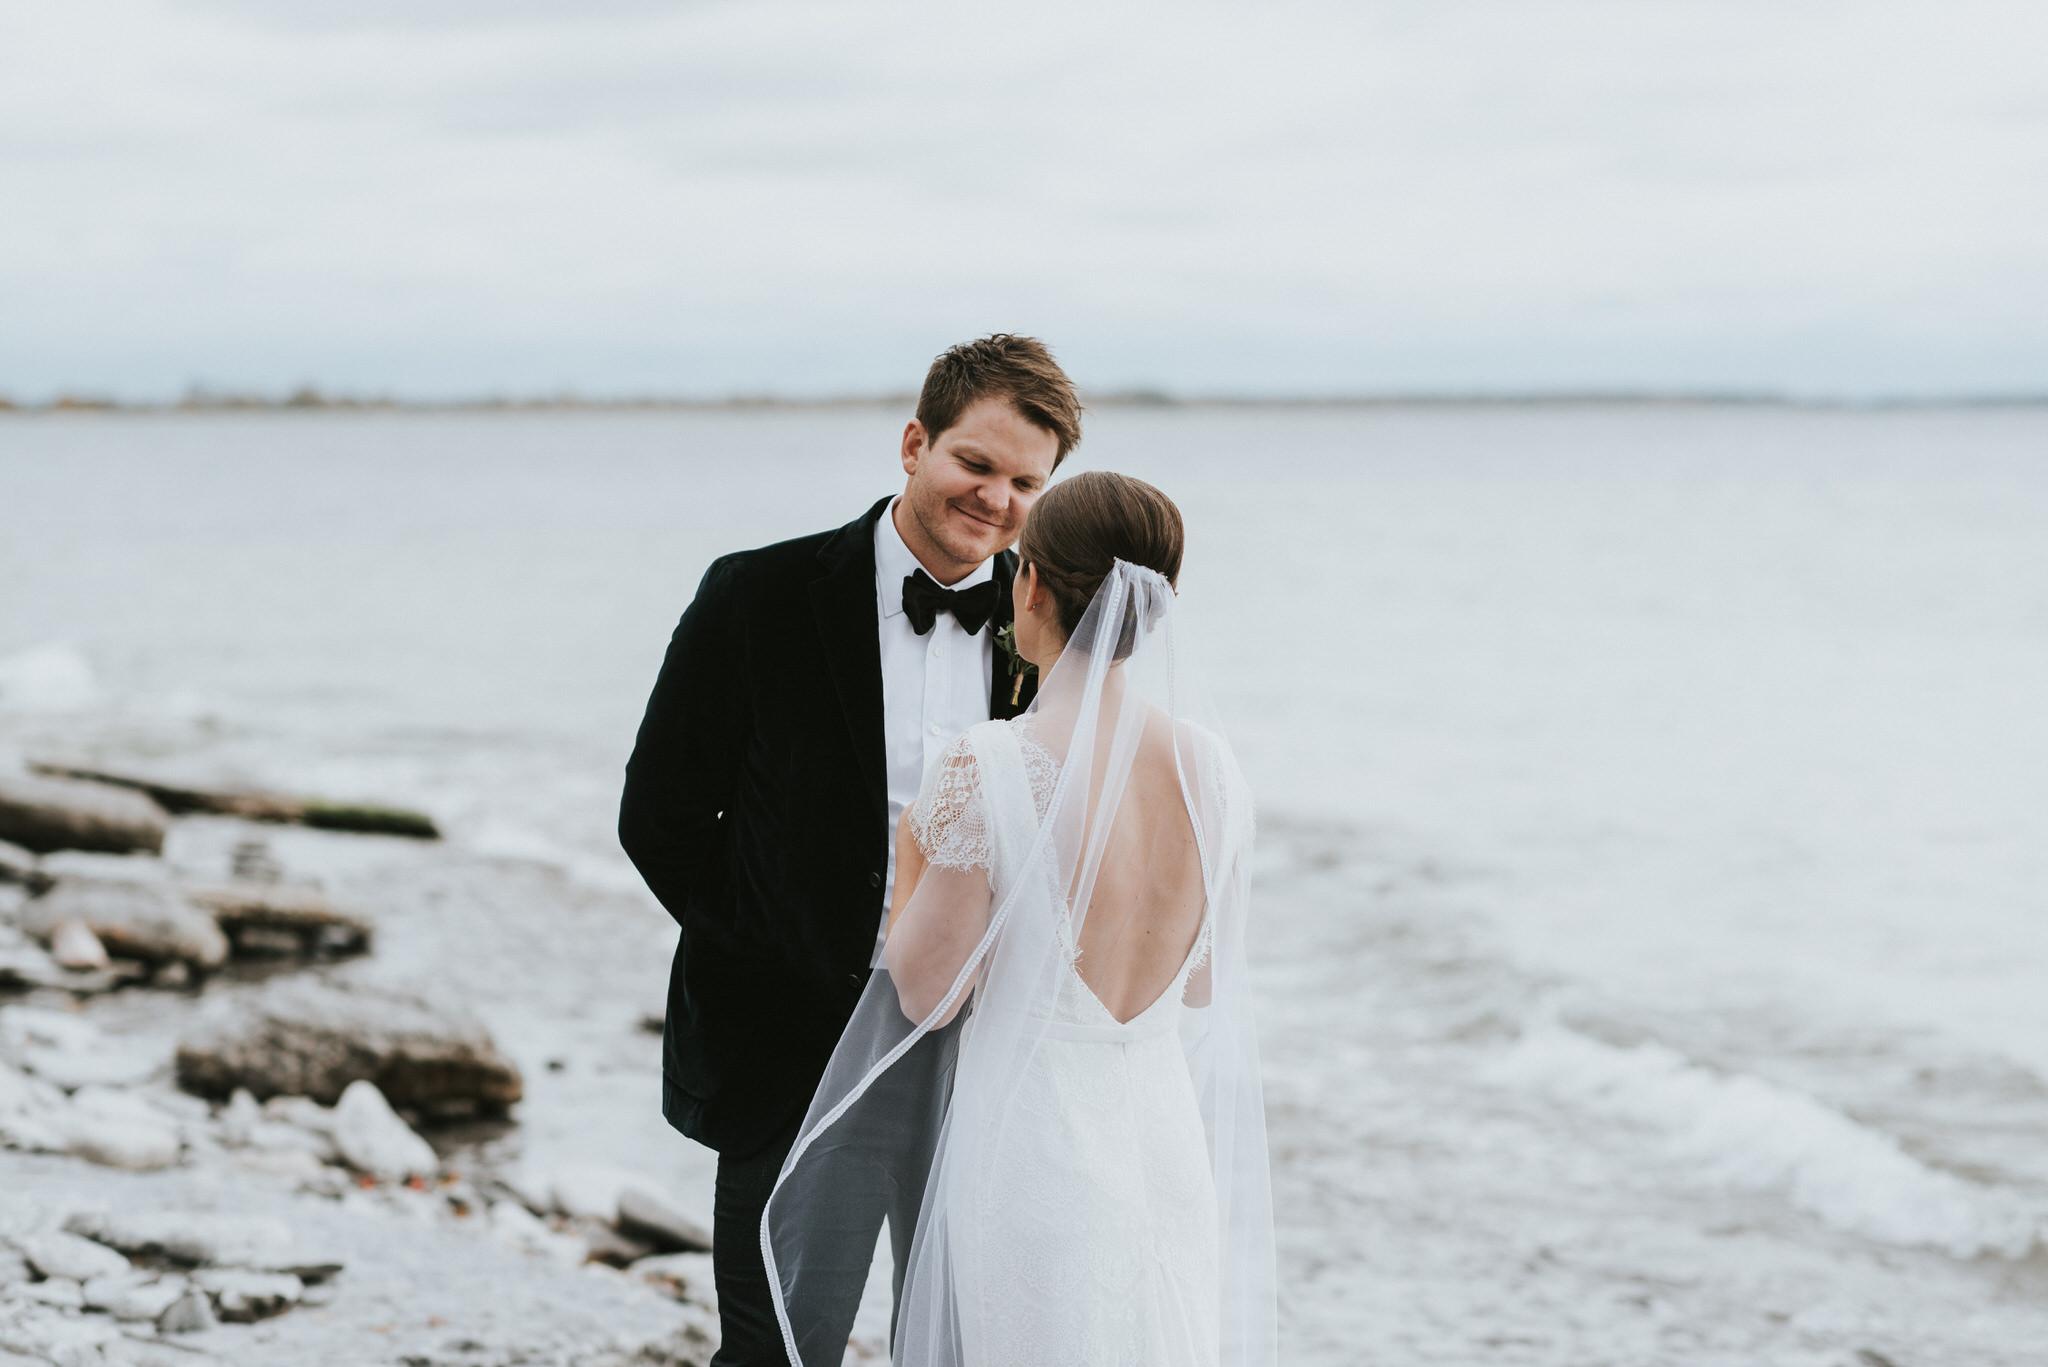 scarletoneillphotography_weddingphotography_prince edward county weddings042.JPG